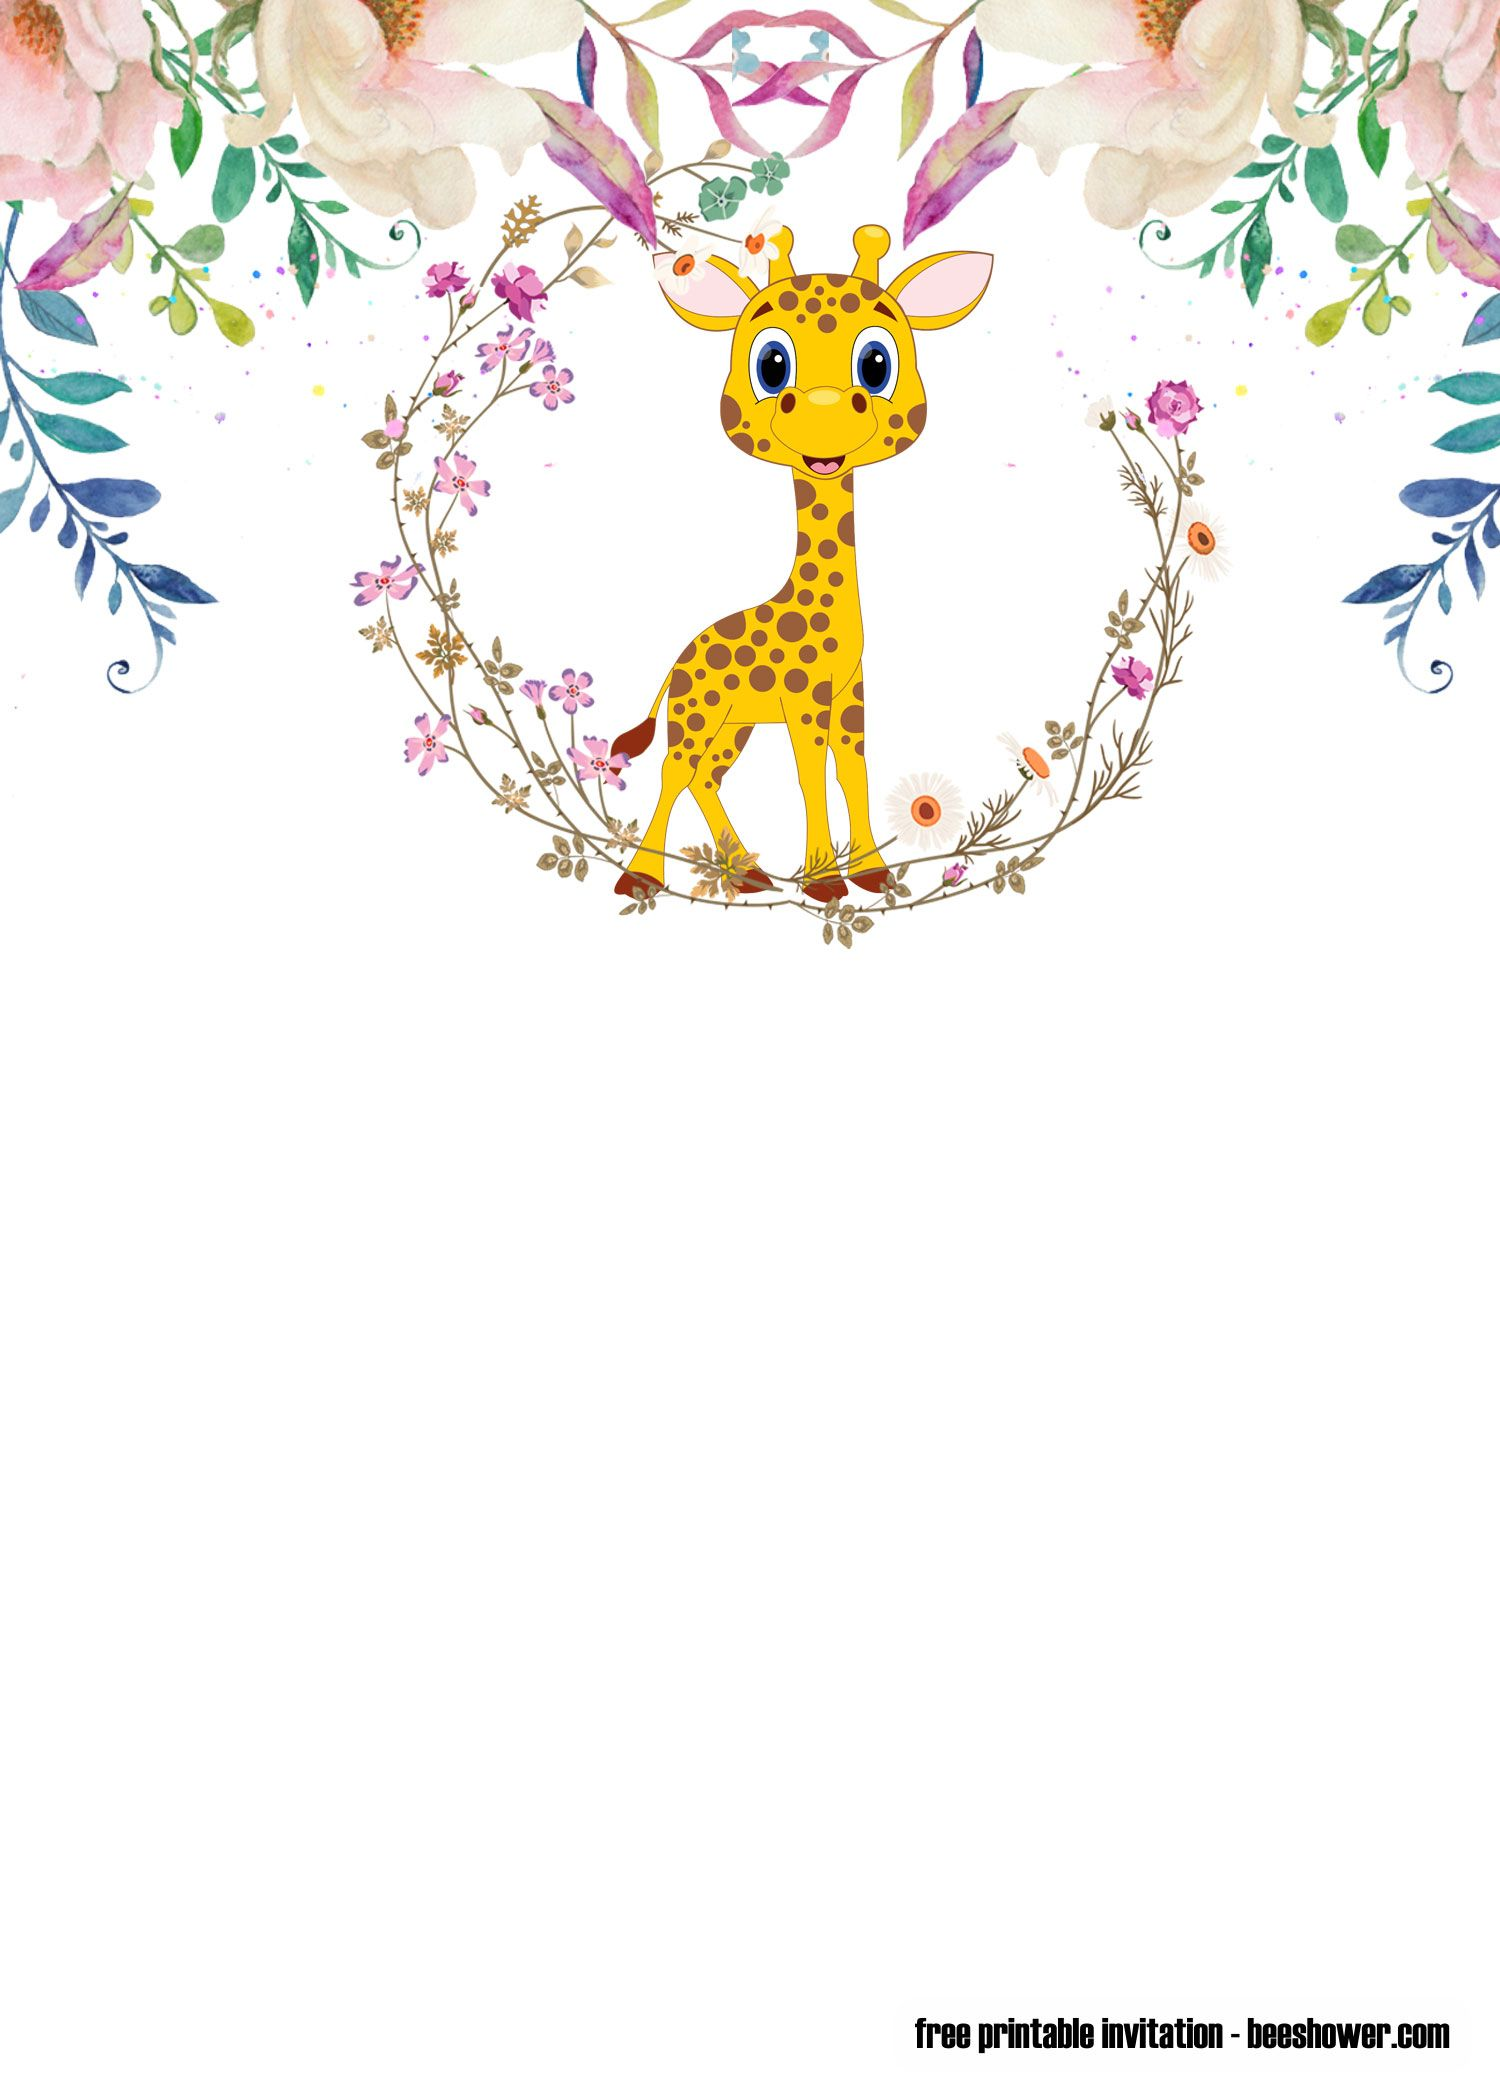 Download Free Cute Giraffe Baby Shower Invitations Templates Baby Shower Invitation Templates Giraffe Baby Shower Invitations Baby Shower Giraffe